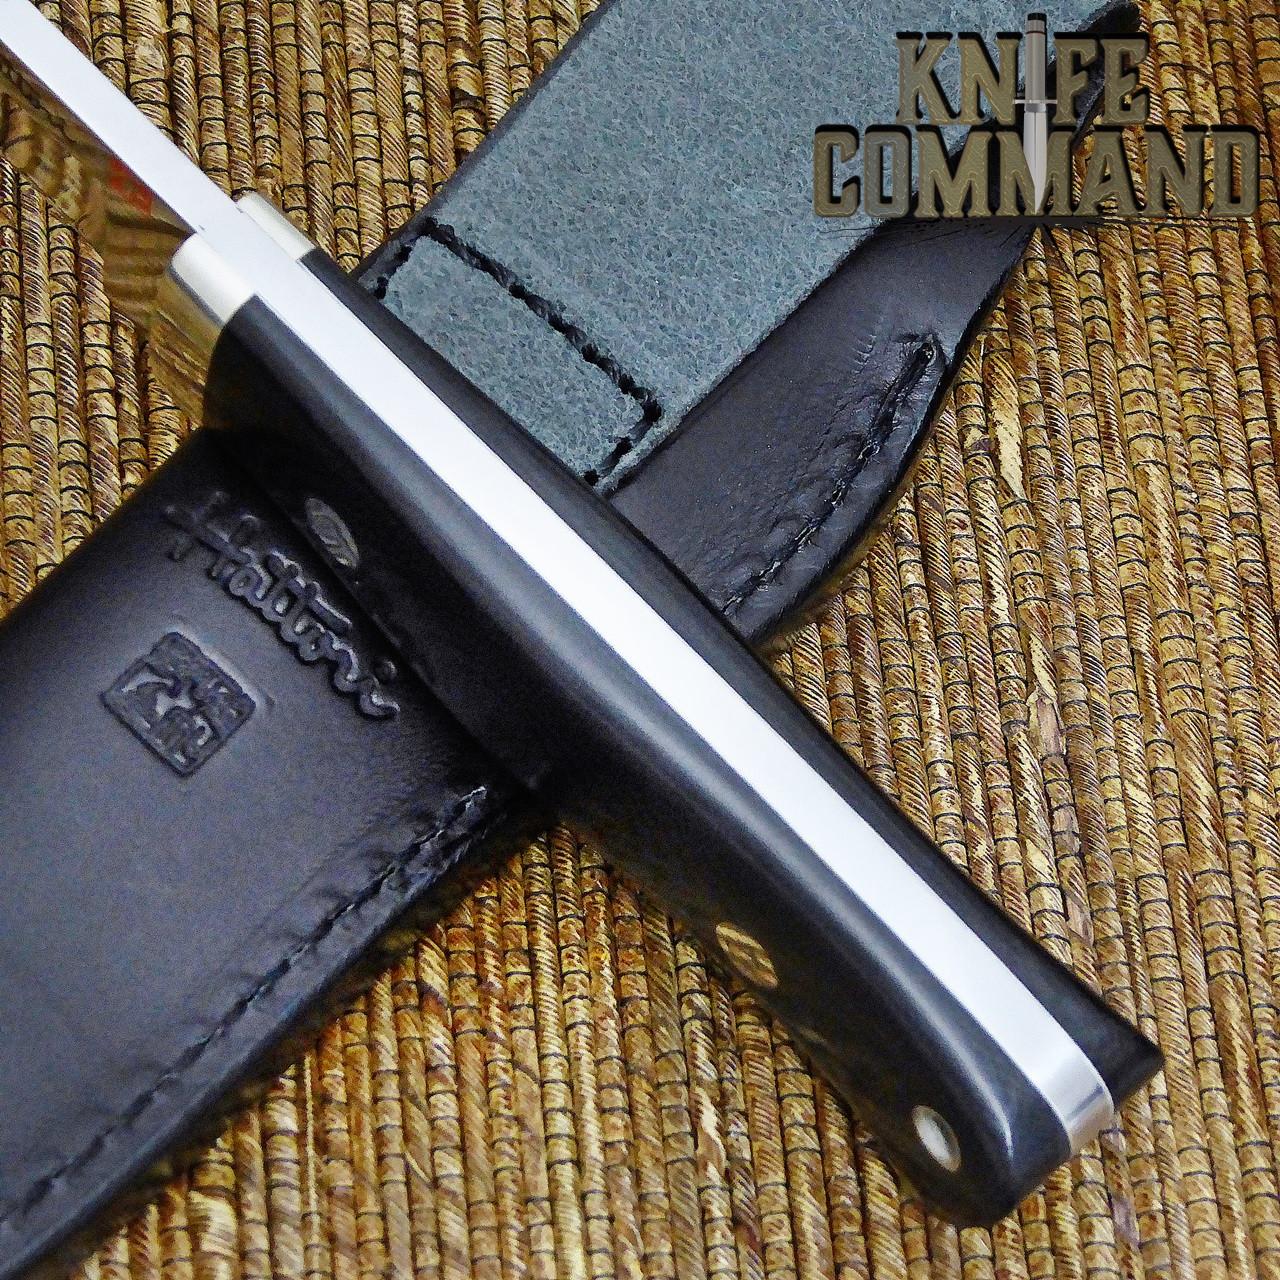 Hattori Knives Dream Hunter Ht-05 White Hunting Knife.  Fine white spacers.